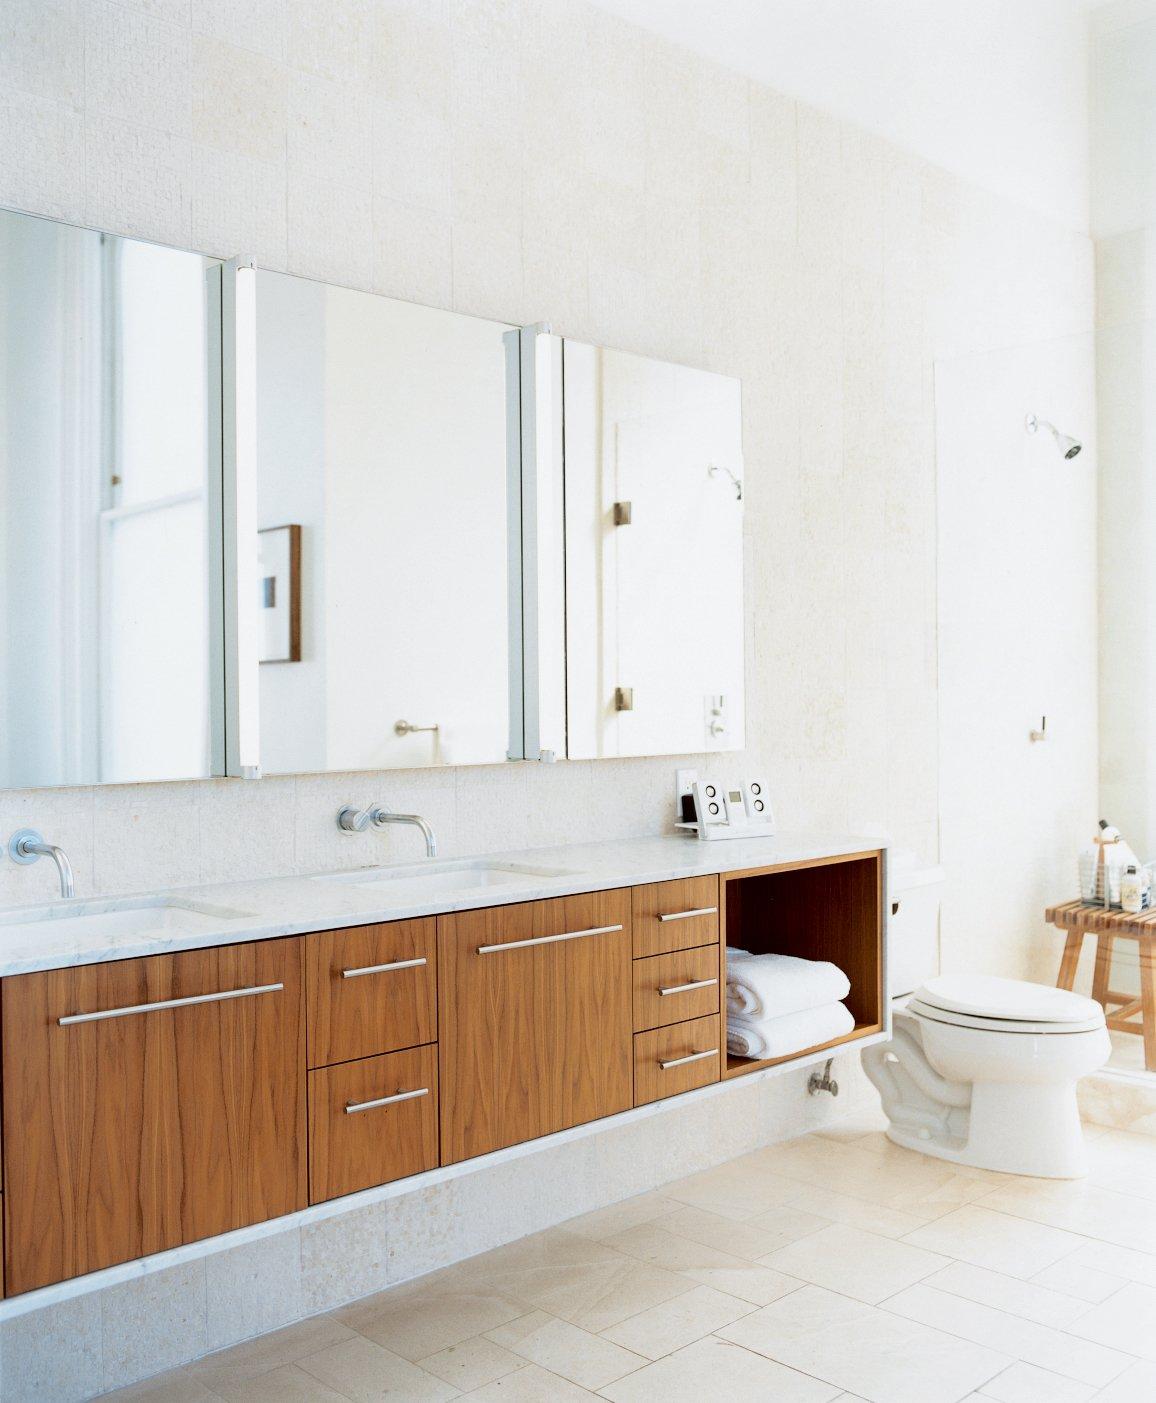 dwell bathroom cabinets | Digitalstudiosweb.com